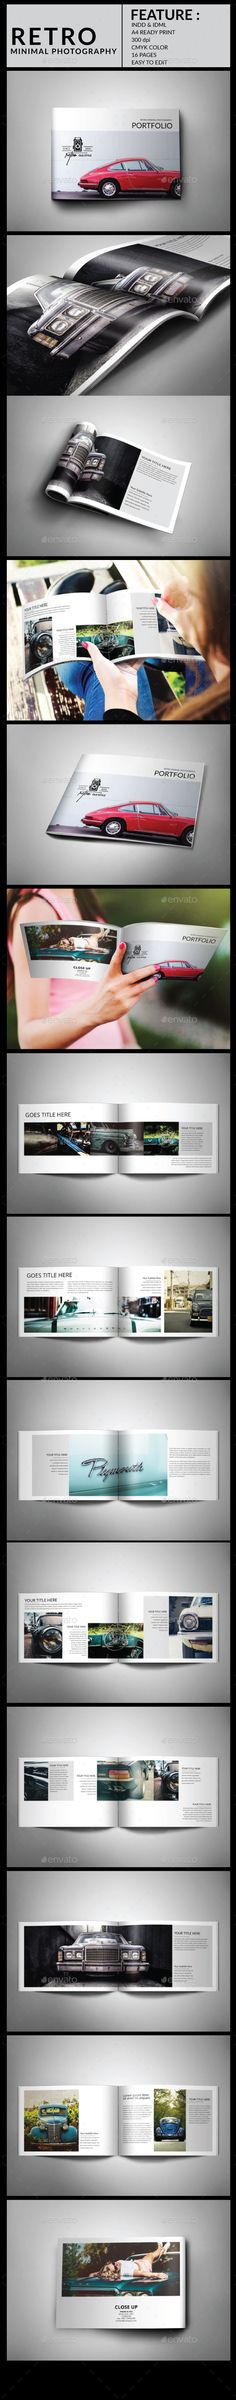 Agency Brochure - retro brochure template